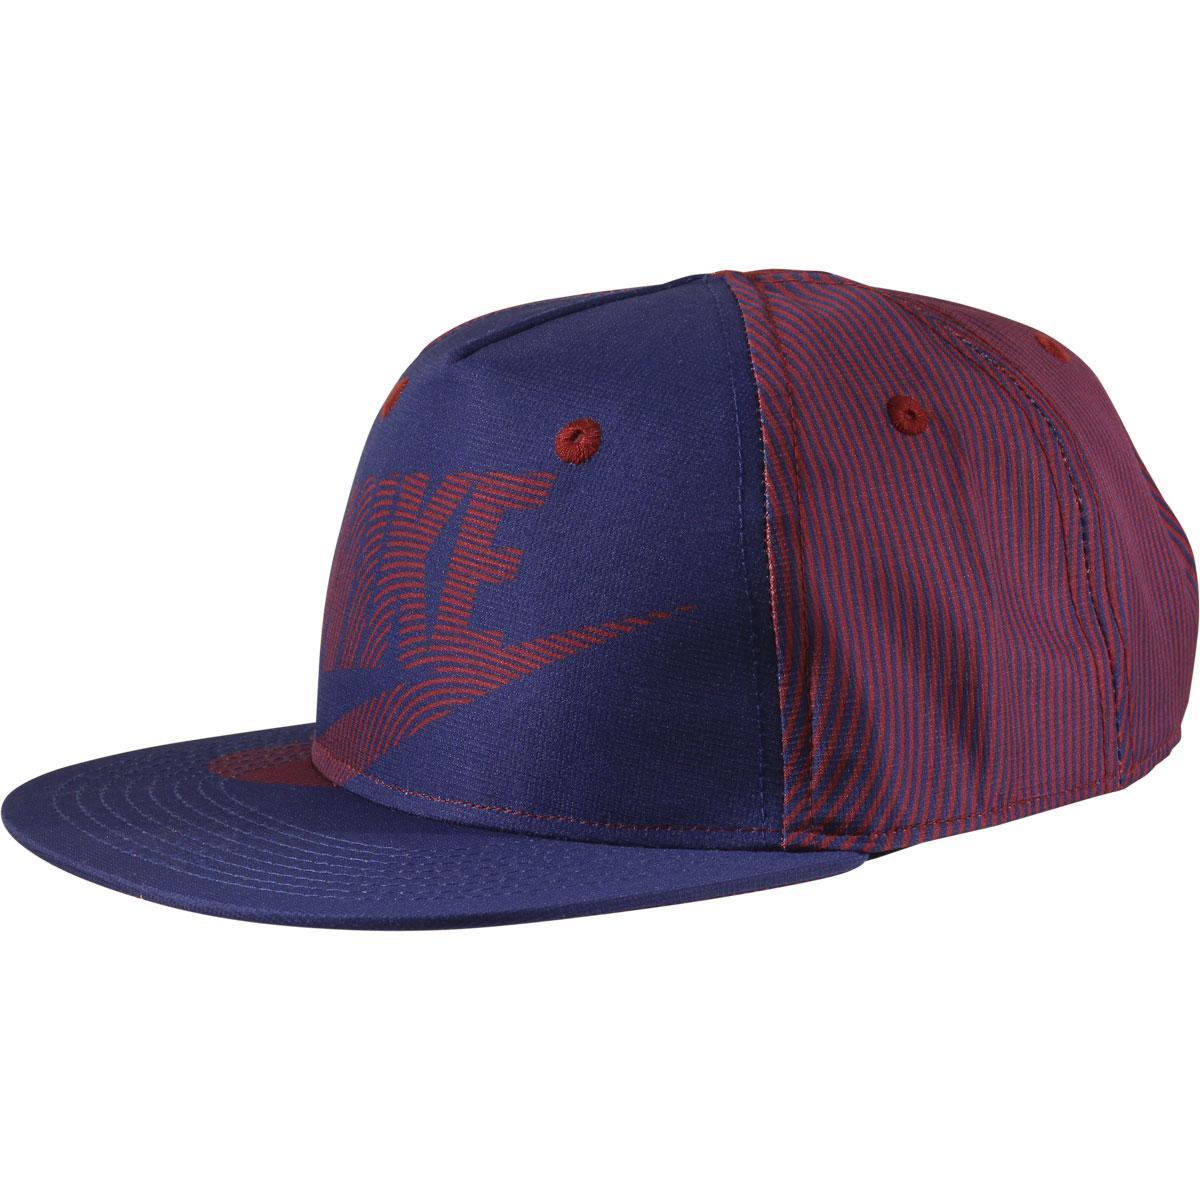 Image of Nike Boy's Futura Print Flat Brim Snapback Baseball Cap Hat - Dark Royal Blue - 4/7